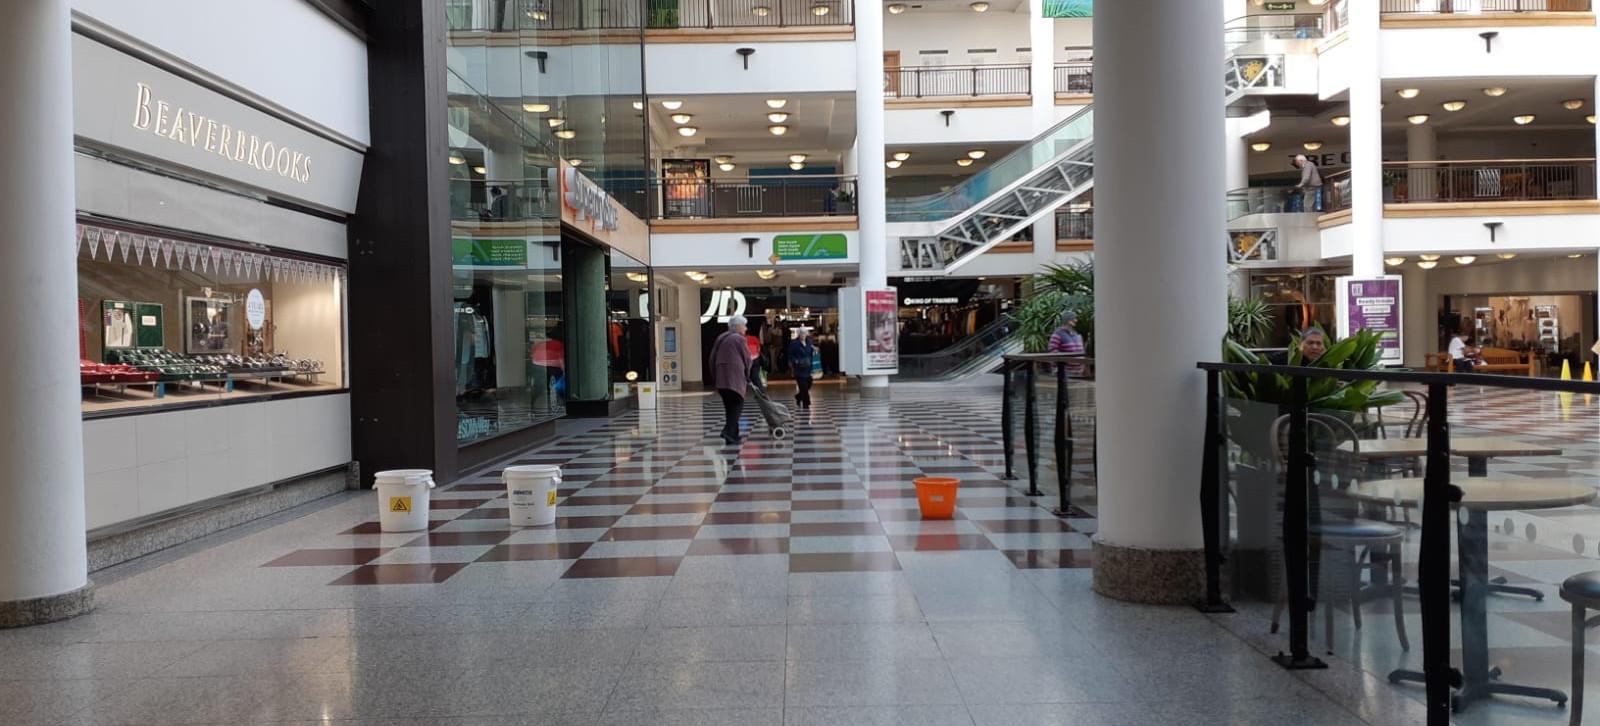 Prestigious shopping mall